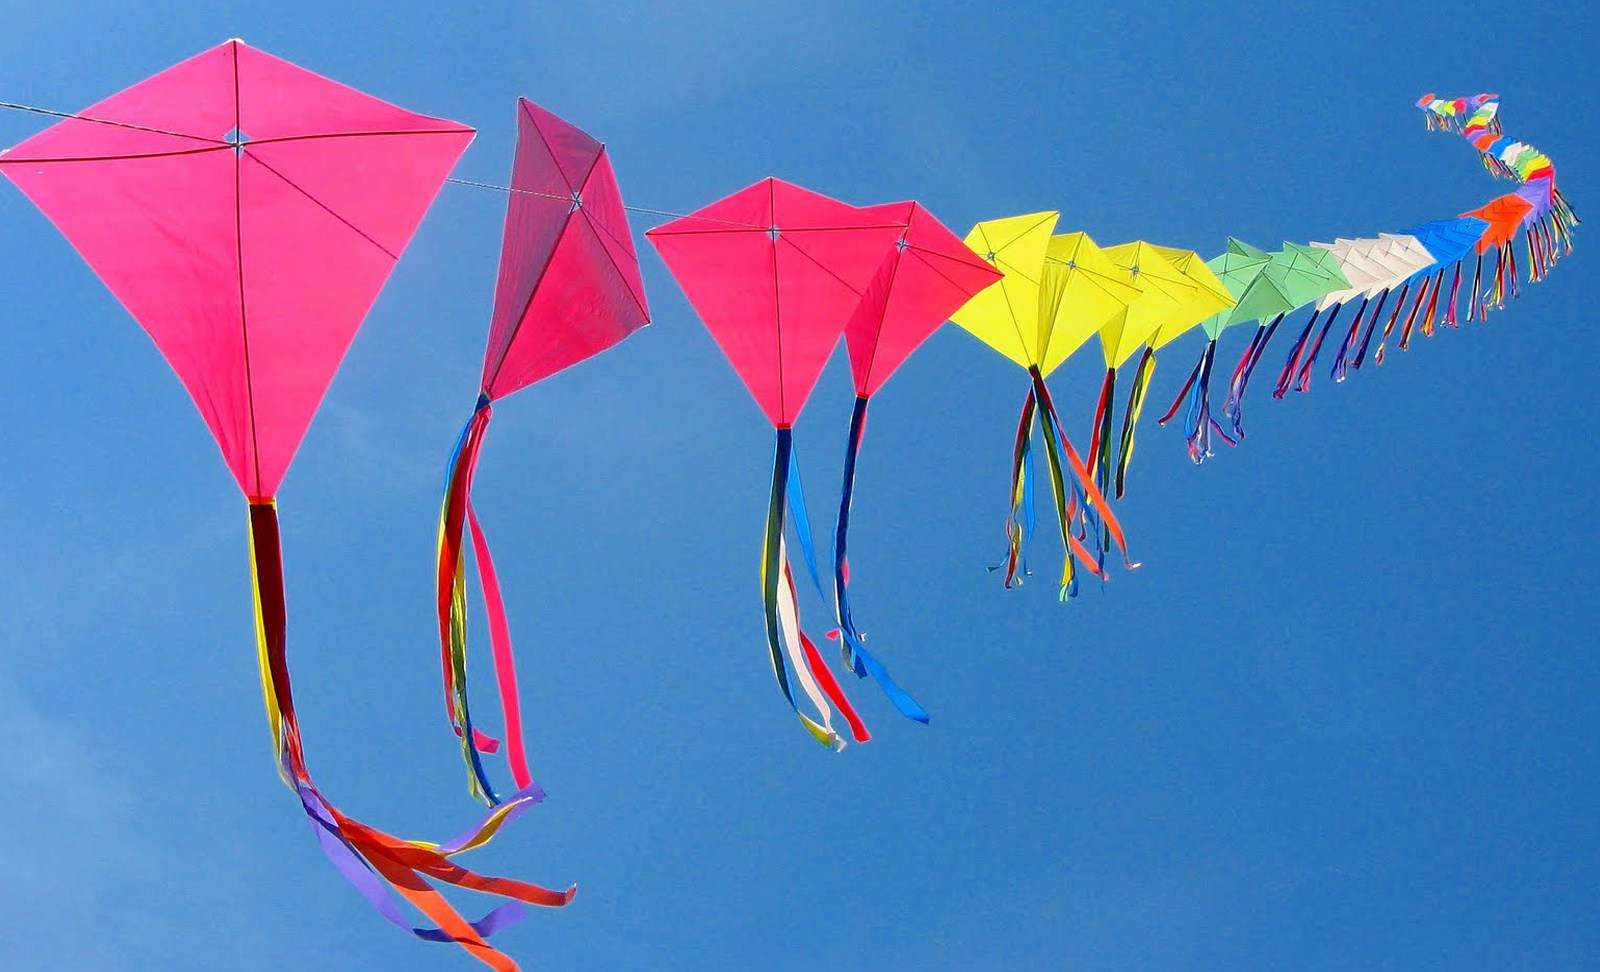 kiteandsweetfestival2021cancelledinhyderabadduetopandemic